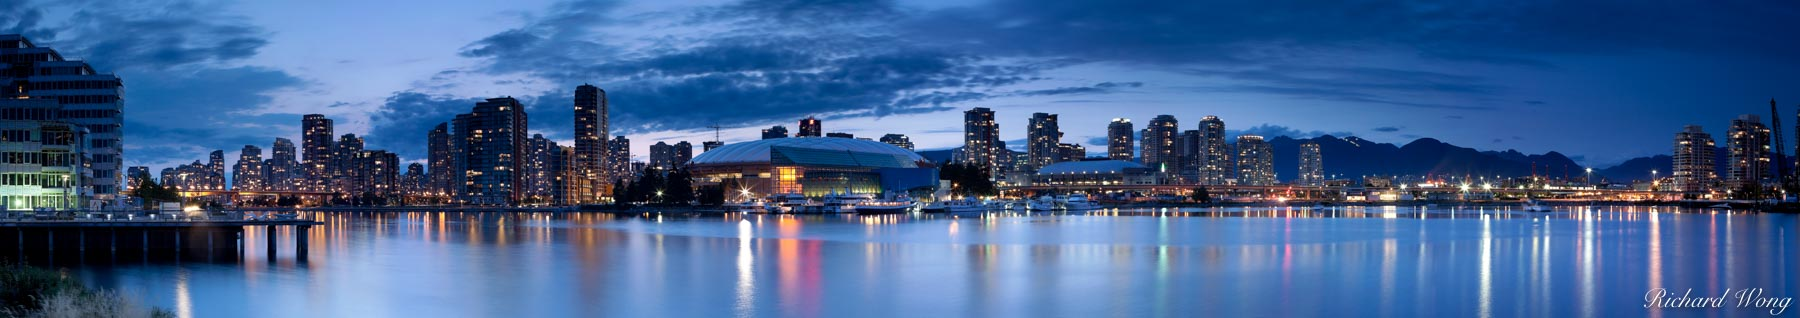 Vancouver Skyline Panoramic and False Creek at Night, British Columbia, Canada, photo, photo